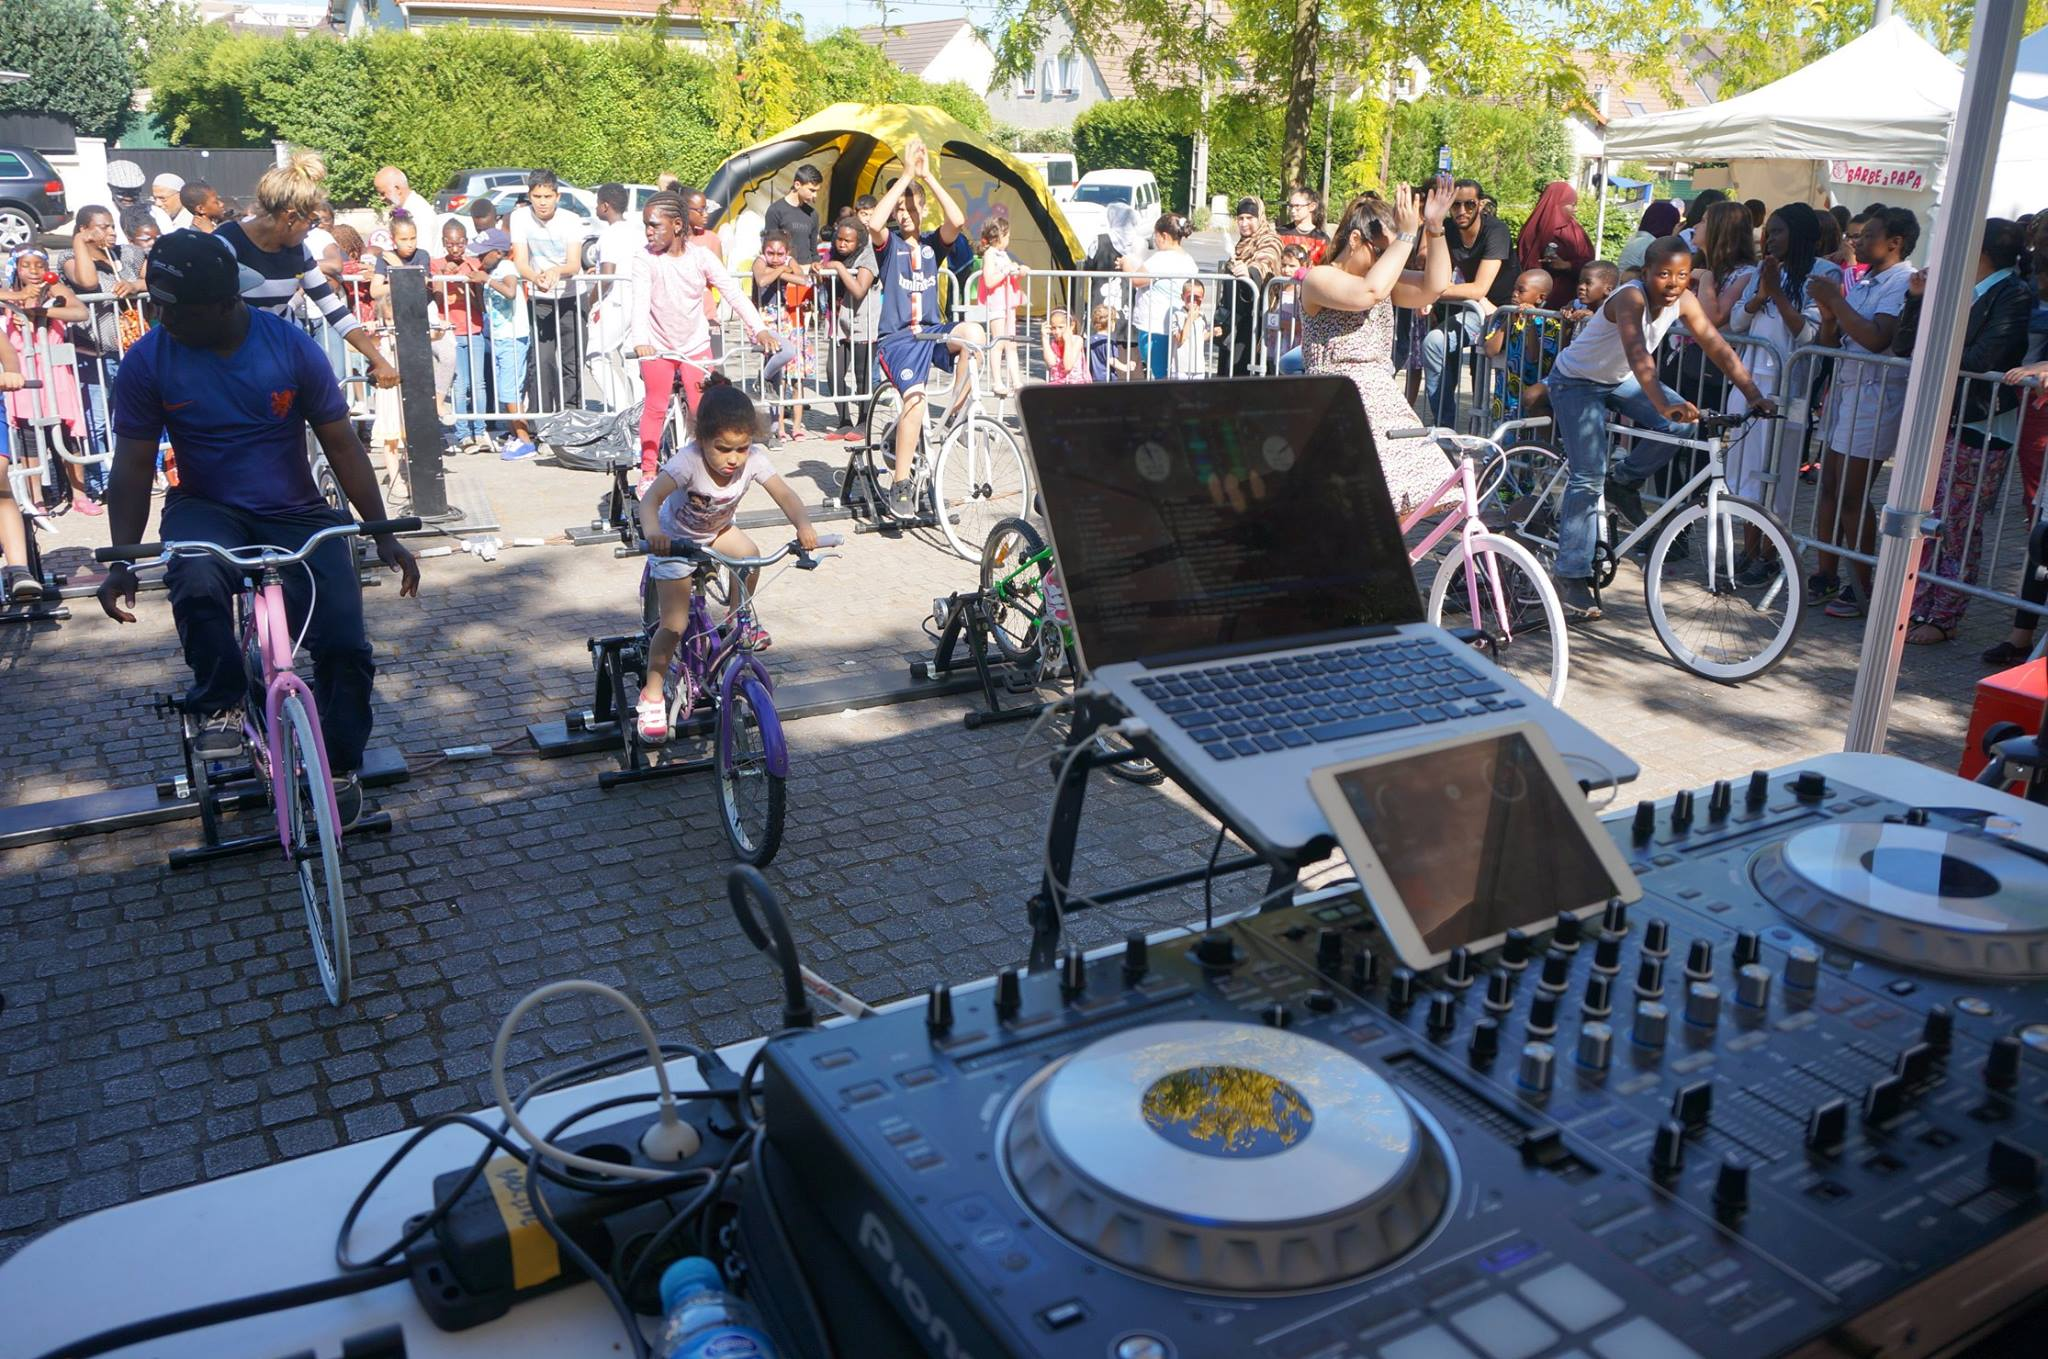 Bike-powered DJ set in Ile-De-France using our equipment © Ludik Énergie